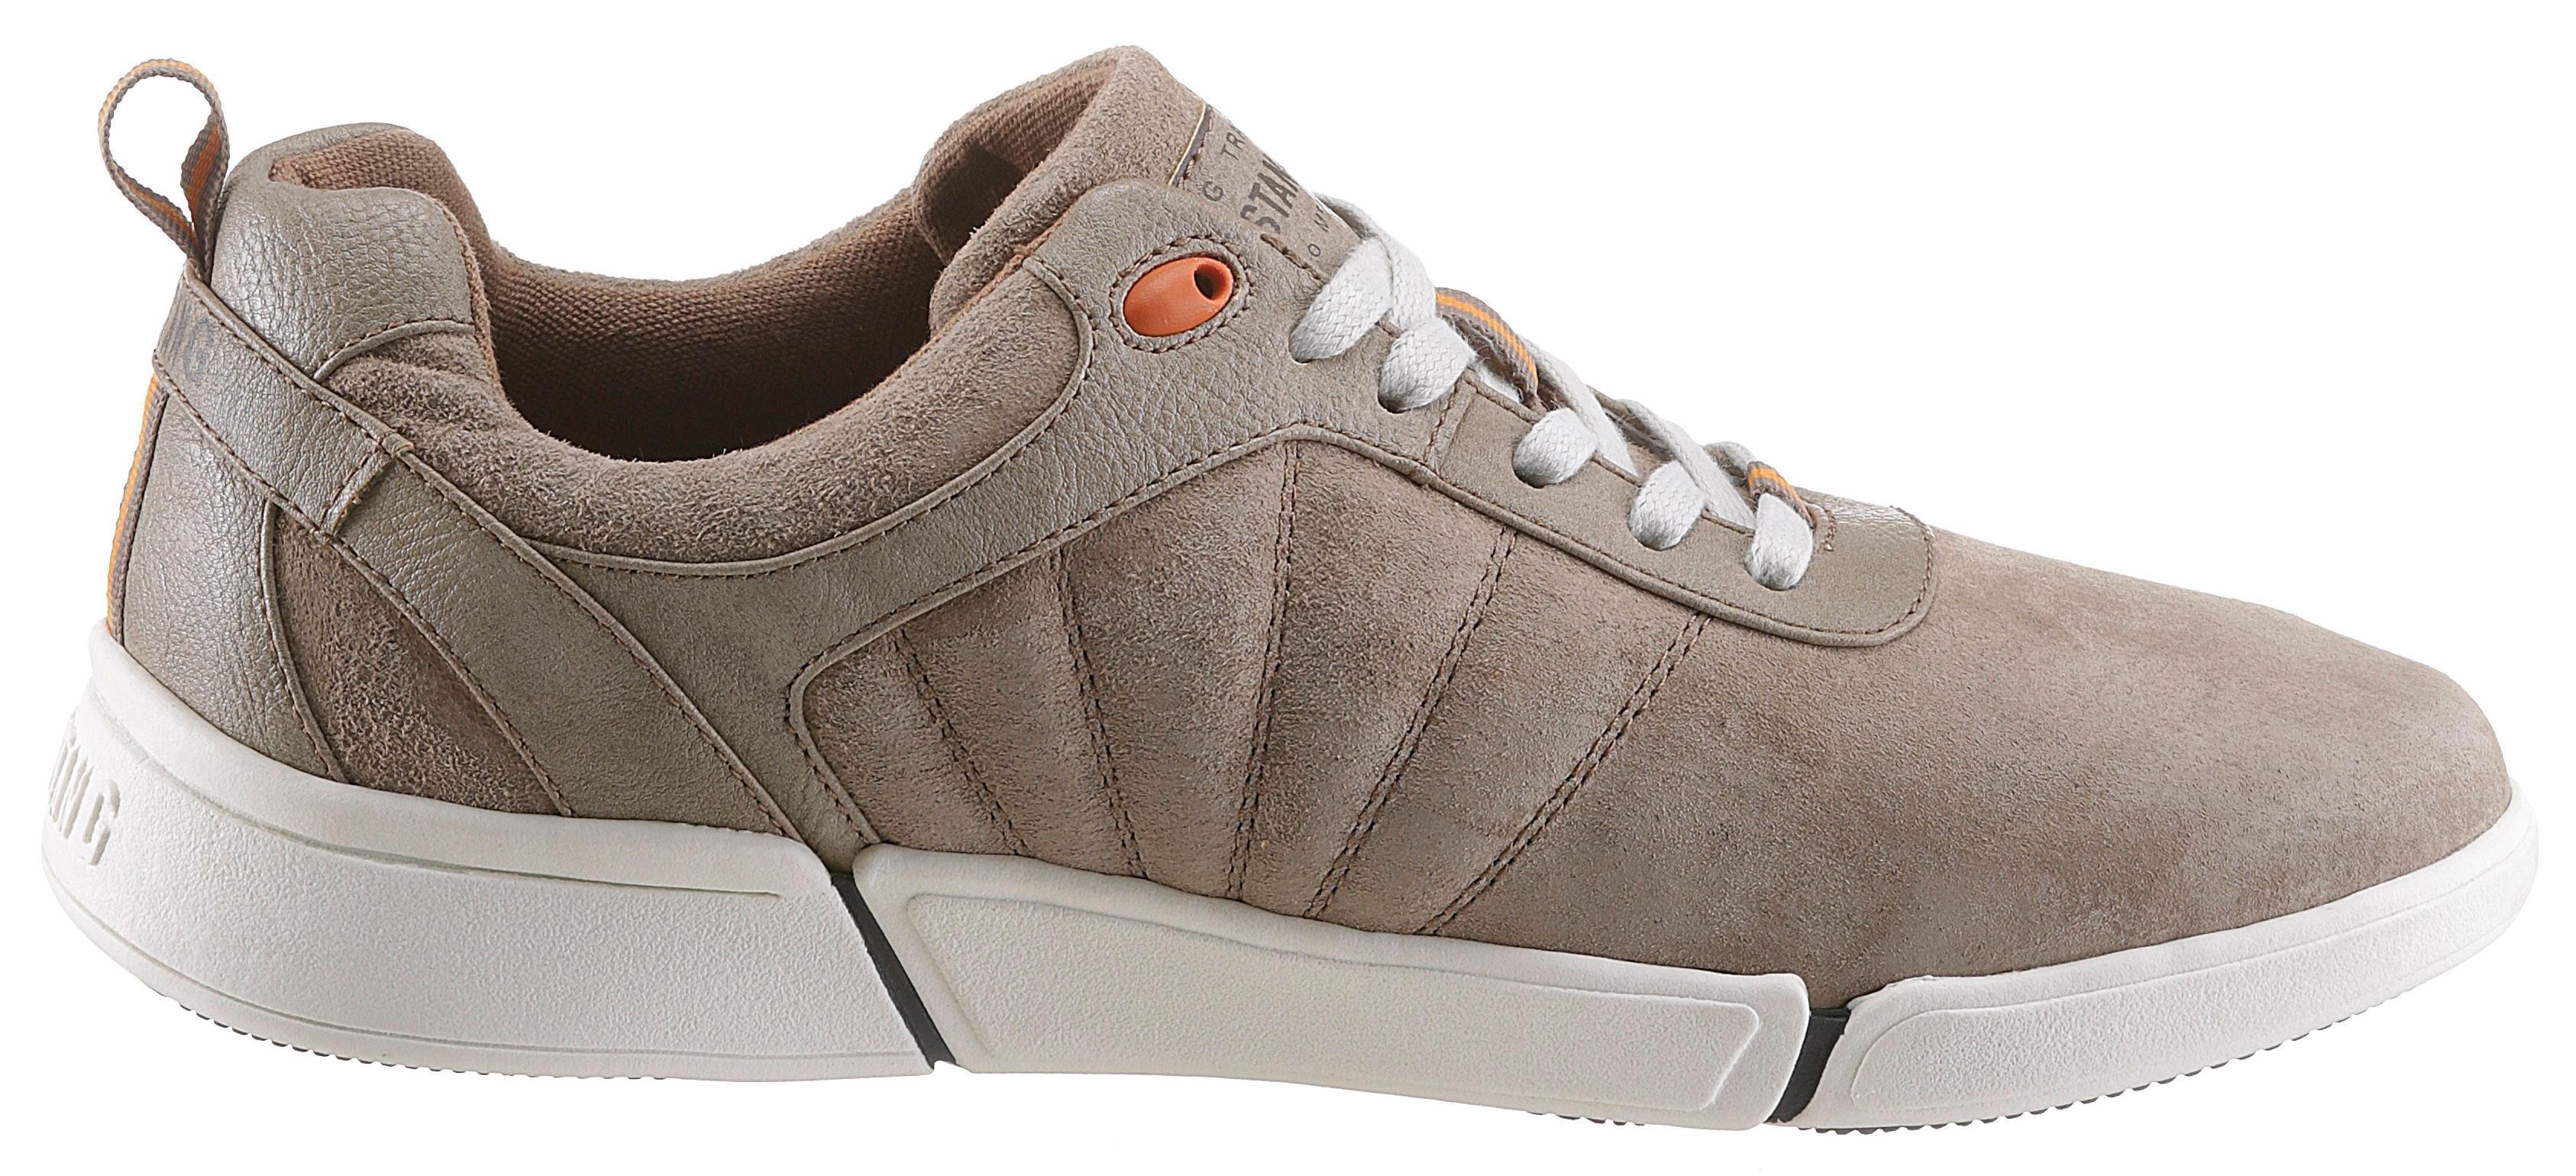 Sneakers Sneakers Sneakers Gekocht Shoes Shoes Gekocht Makkelijk Mustang Shoes Mustang Mustang Makkelijk PXuTOkwZi